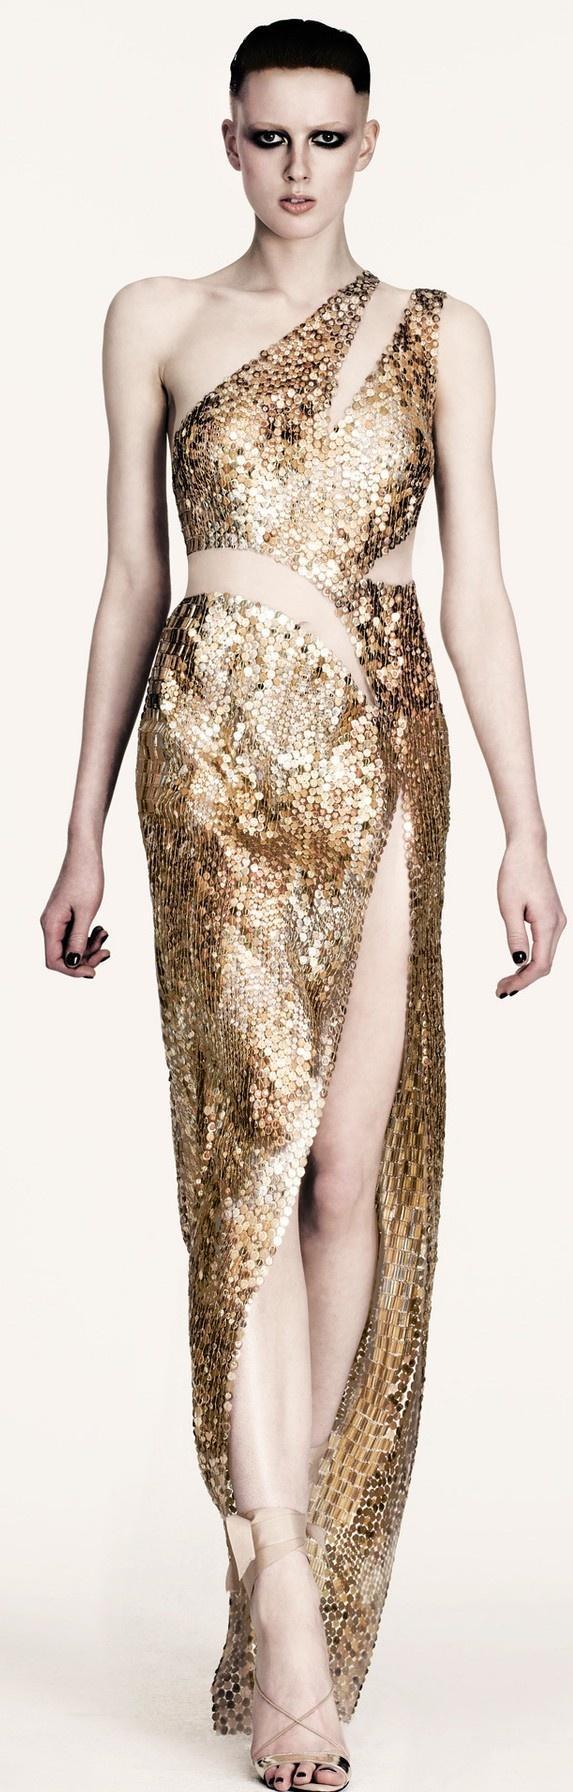 Wedding - Gowns...Glamorus Golds